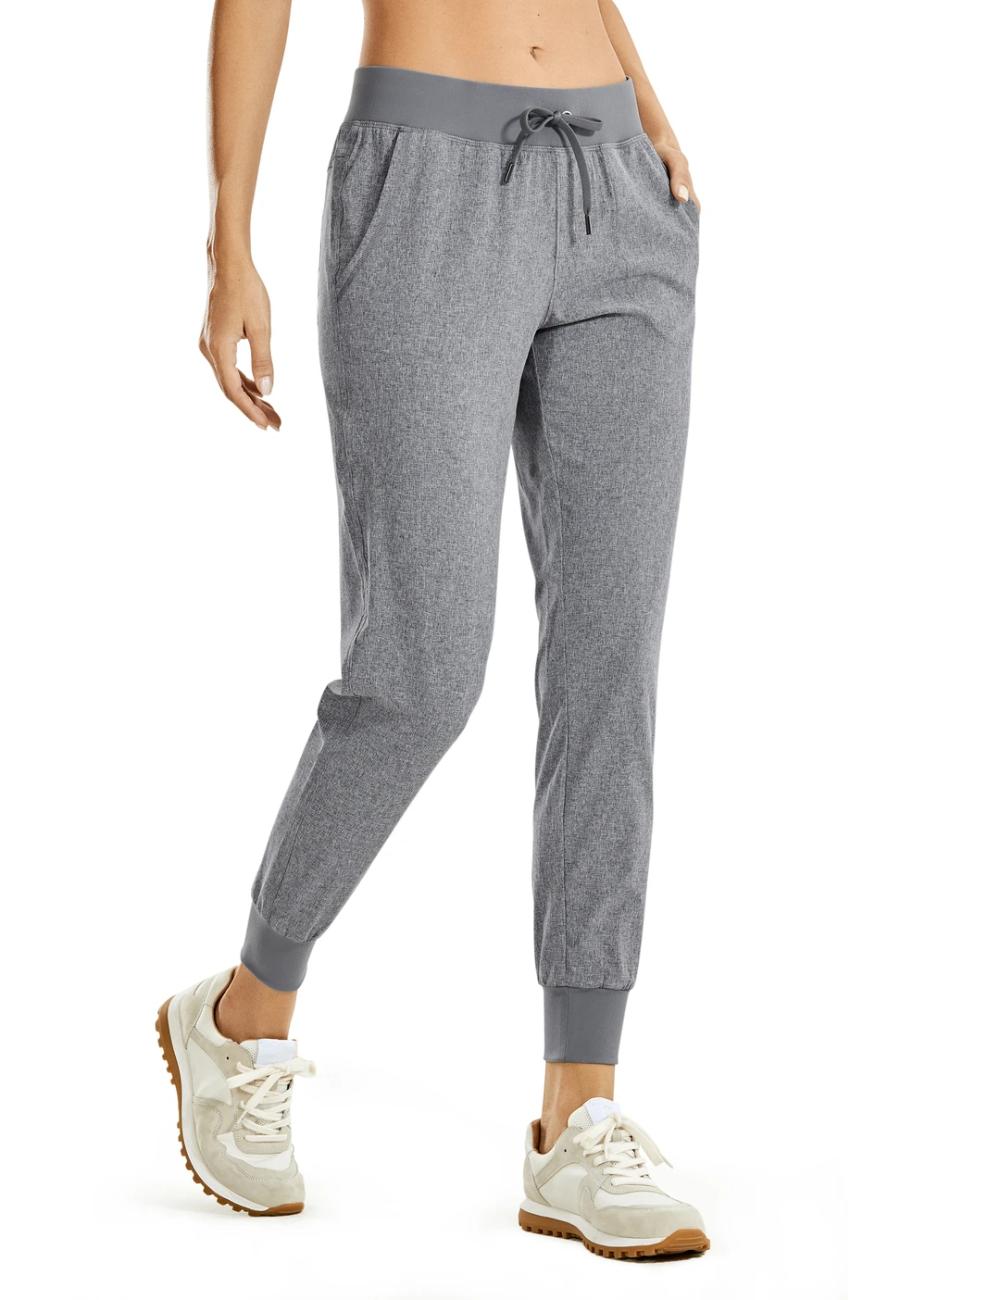 23++ Womens drawstring yoga pants inspirations